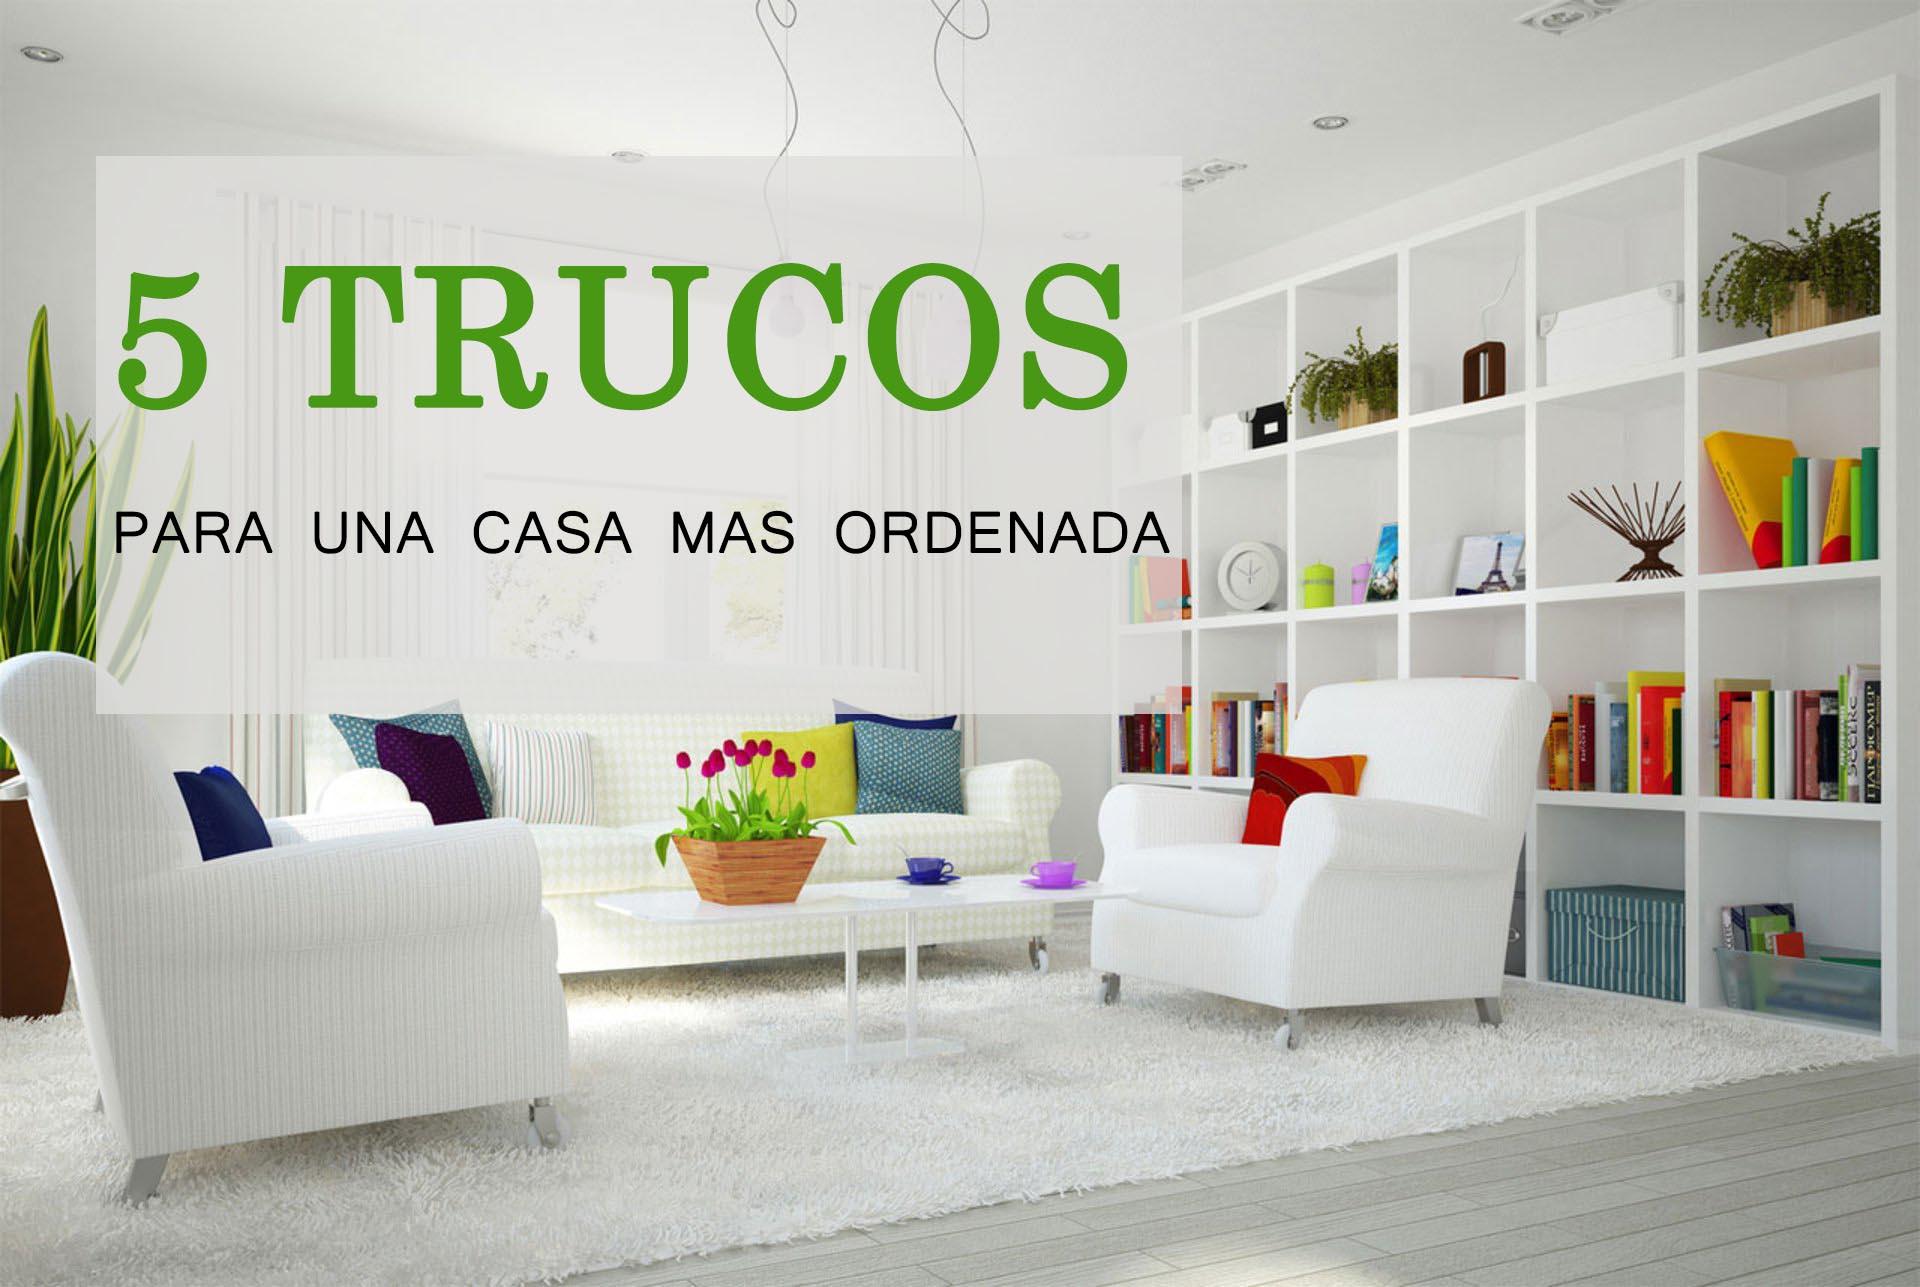 5 trucos para una casa m s ordenada the beautiful project - Trucos de casa ...